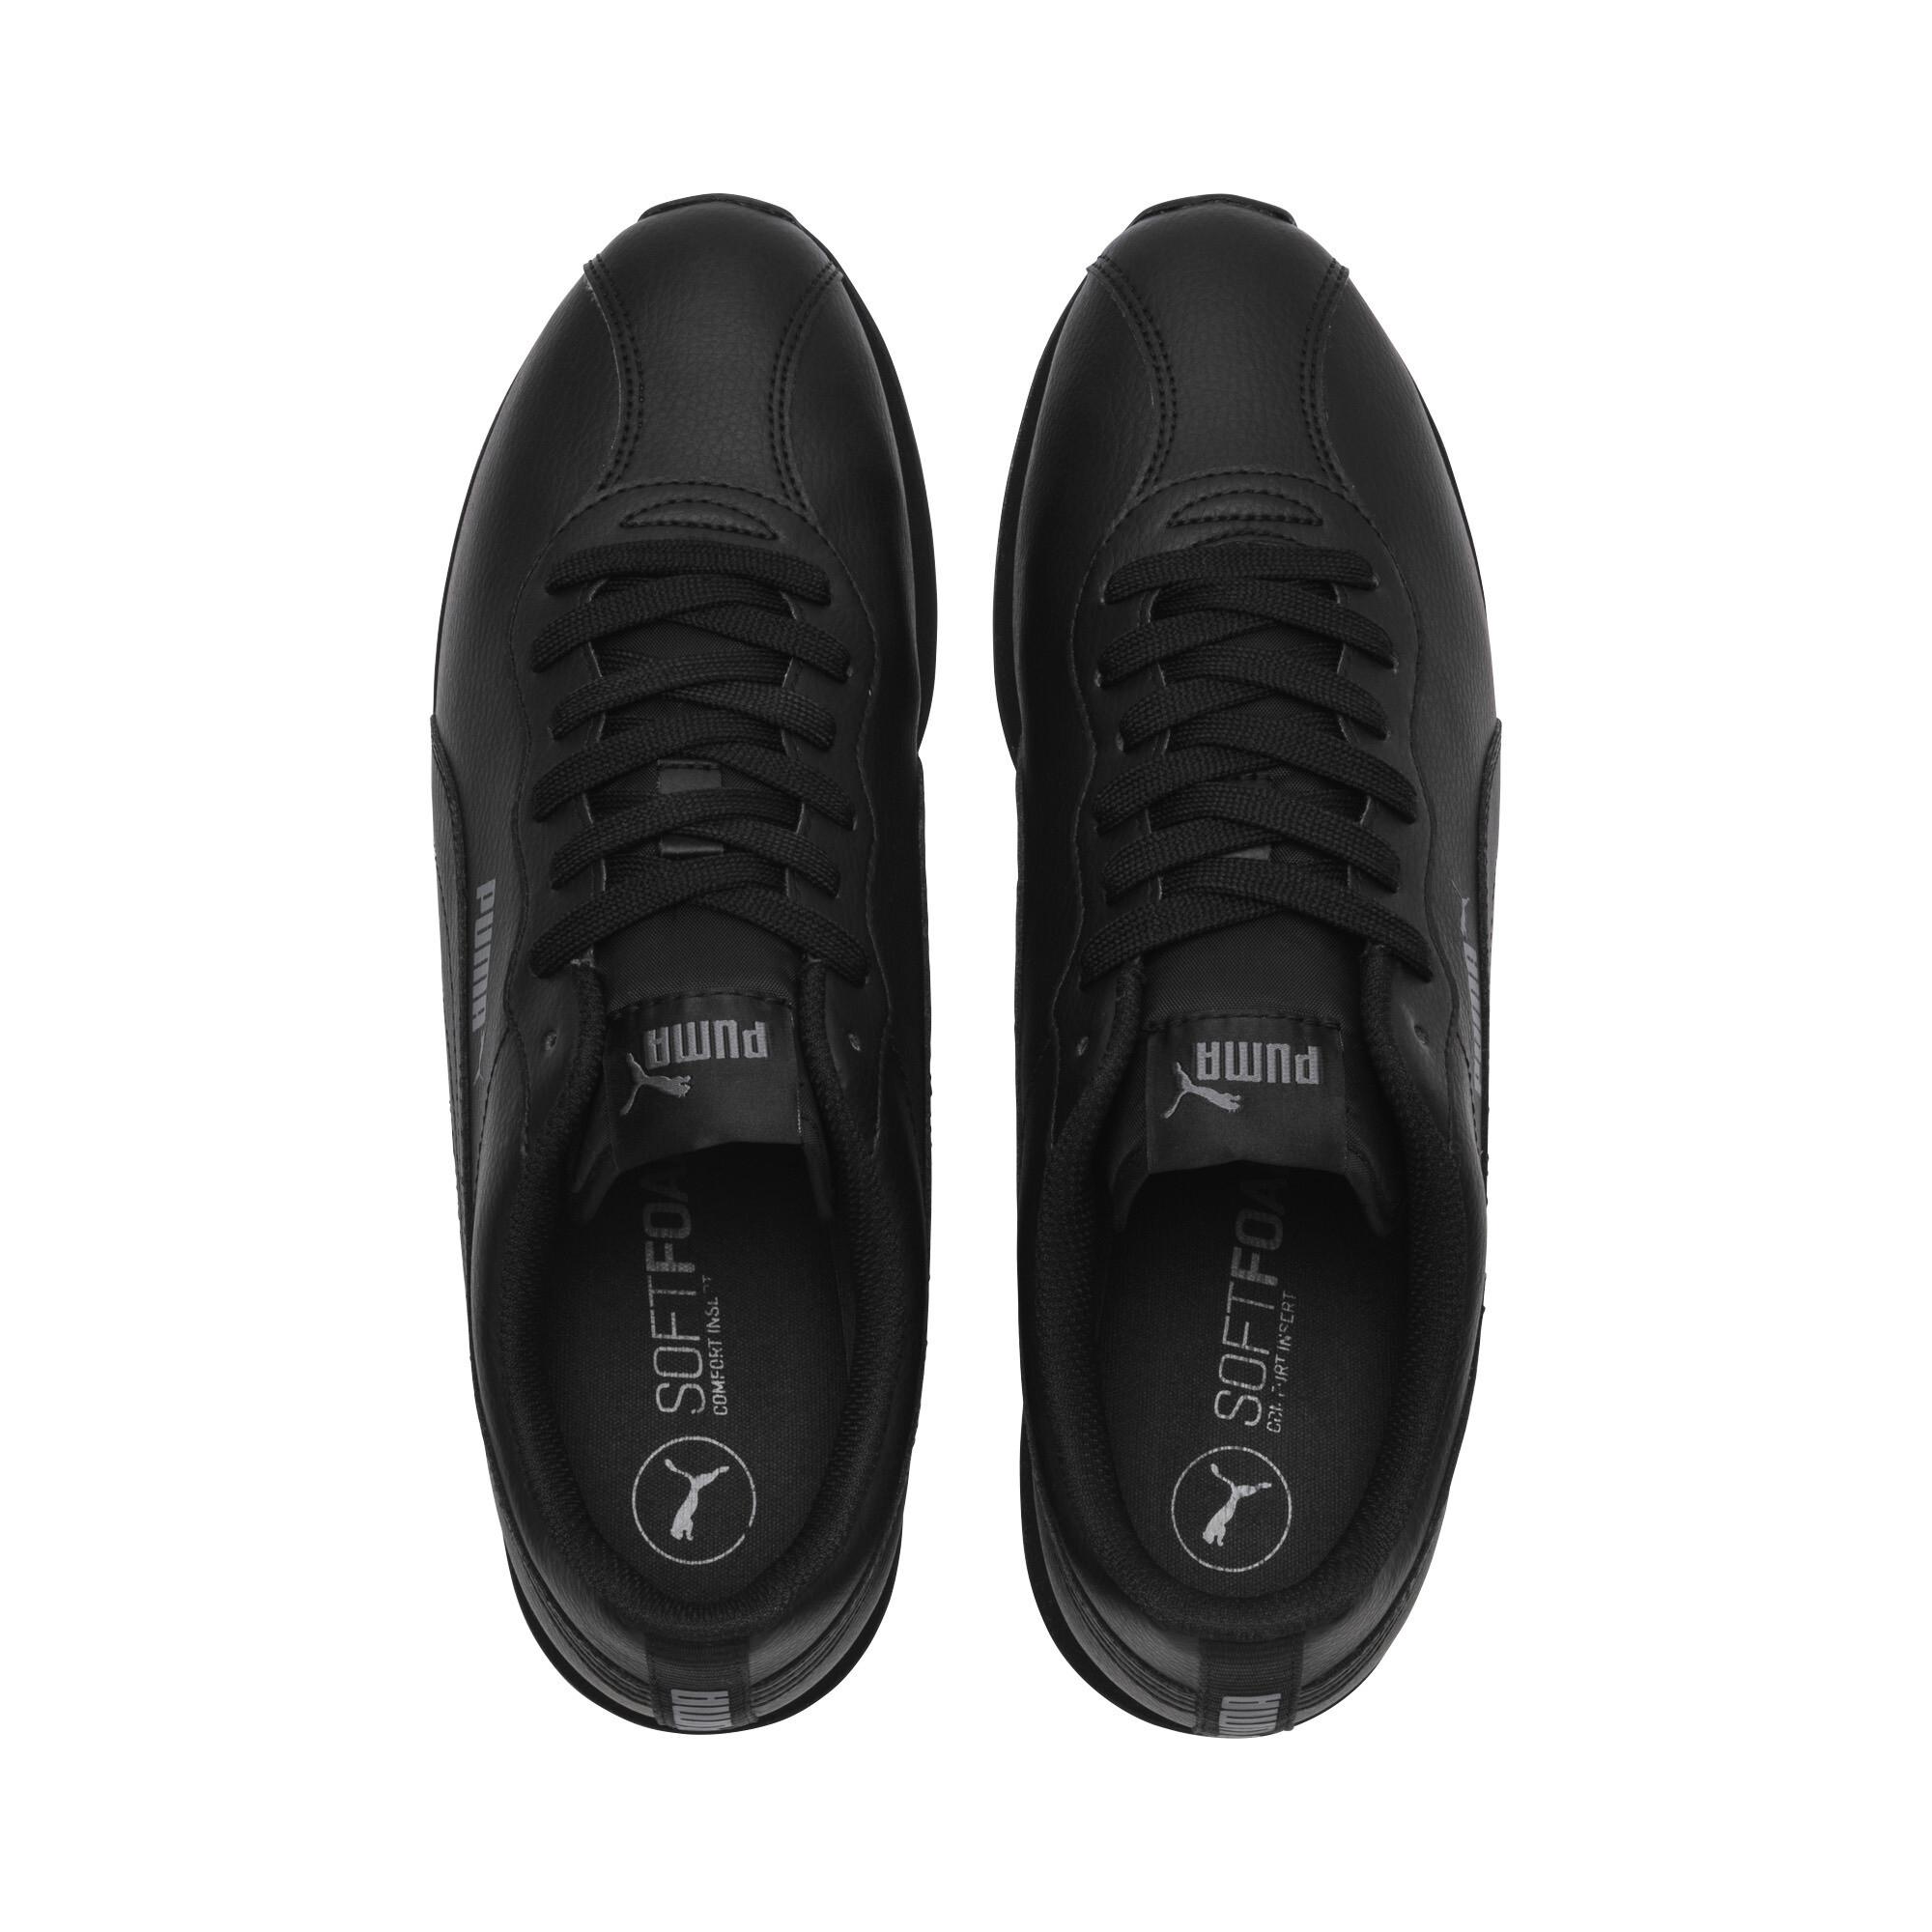 PUMA-Men-039-s-Turin-II-Sneakers thumbnail 7